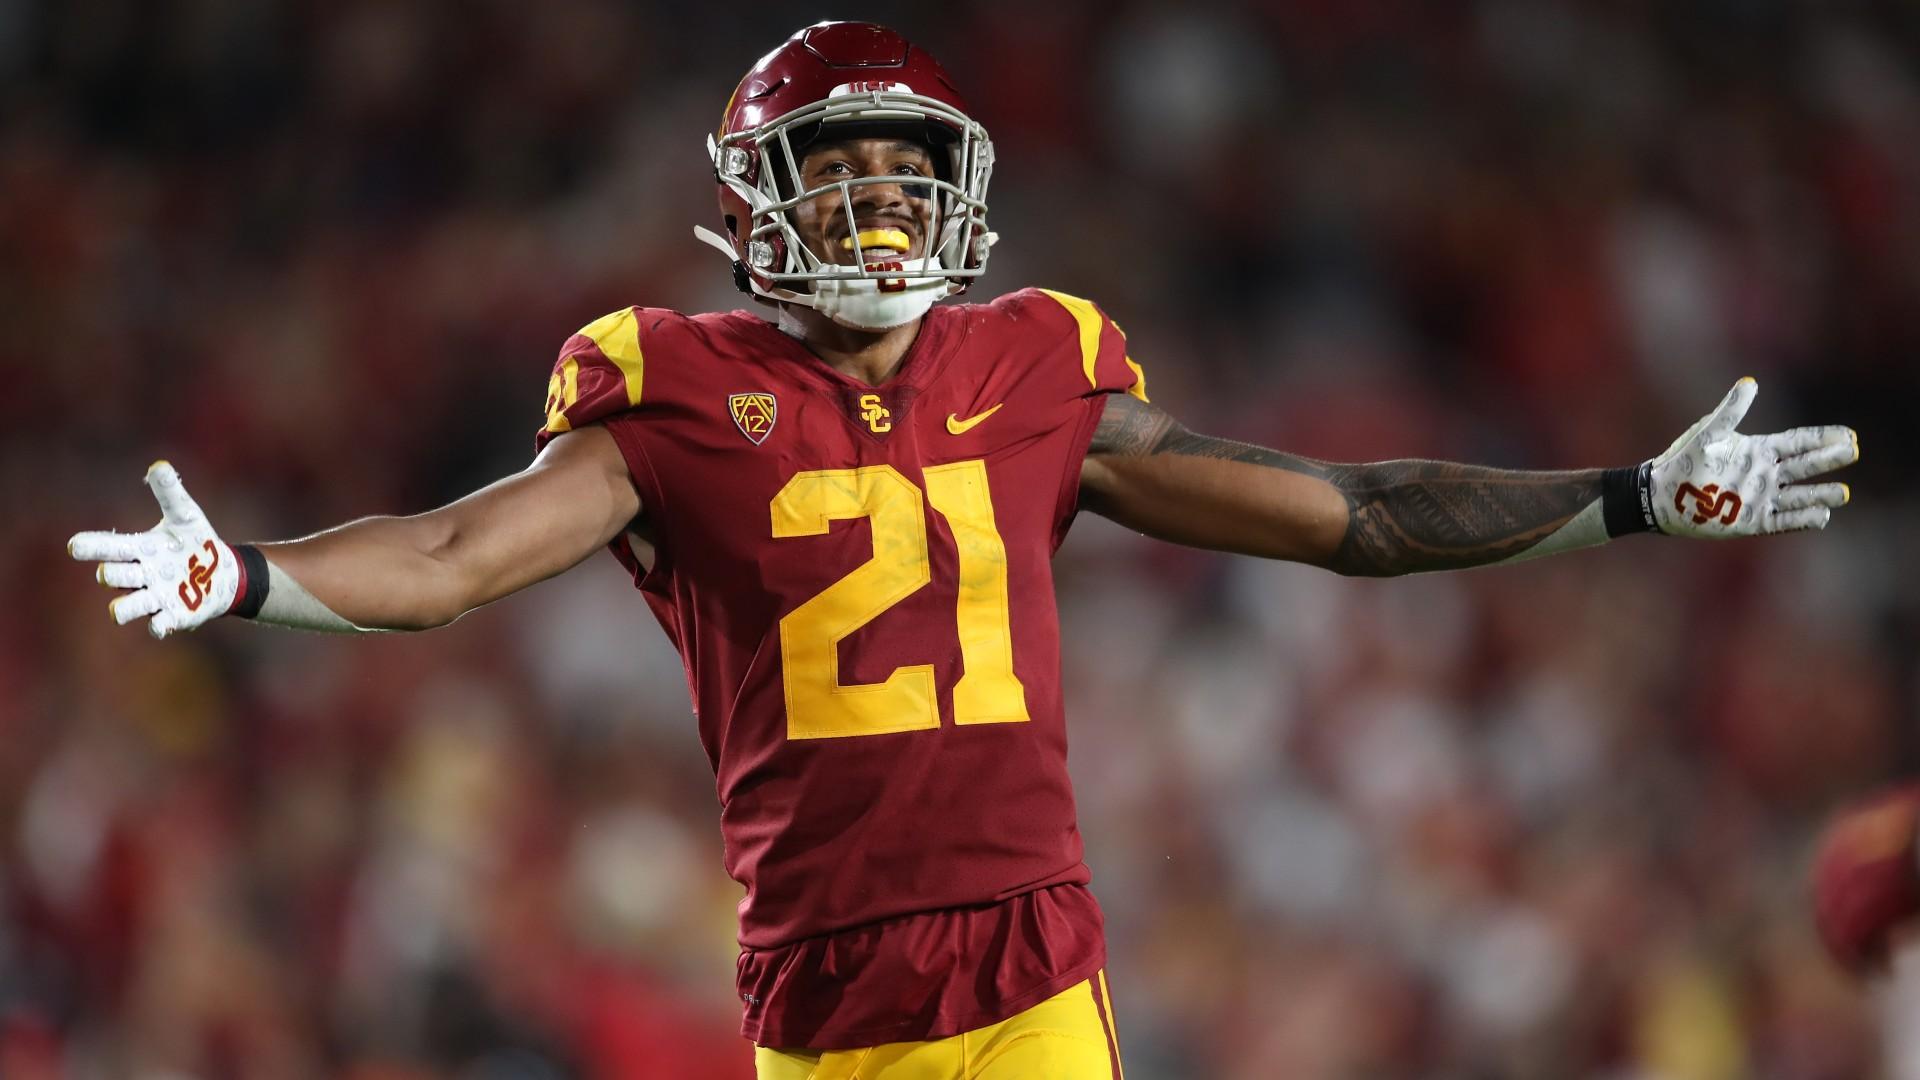 Saturday College Football Odds & Picks: USC vs. Arizona State, Nebraska vs. Northwestern, More Best Bets for Week 10's Noon Kickoffs article feature image